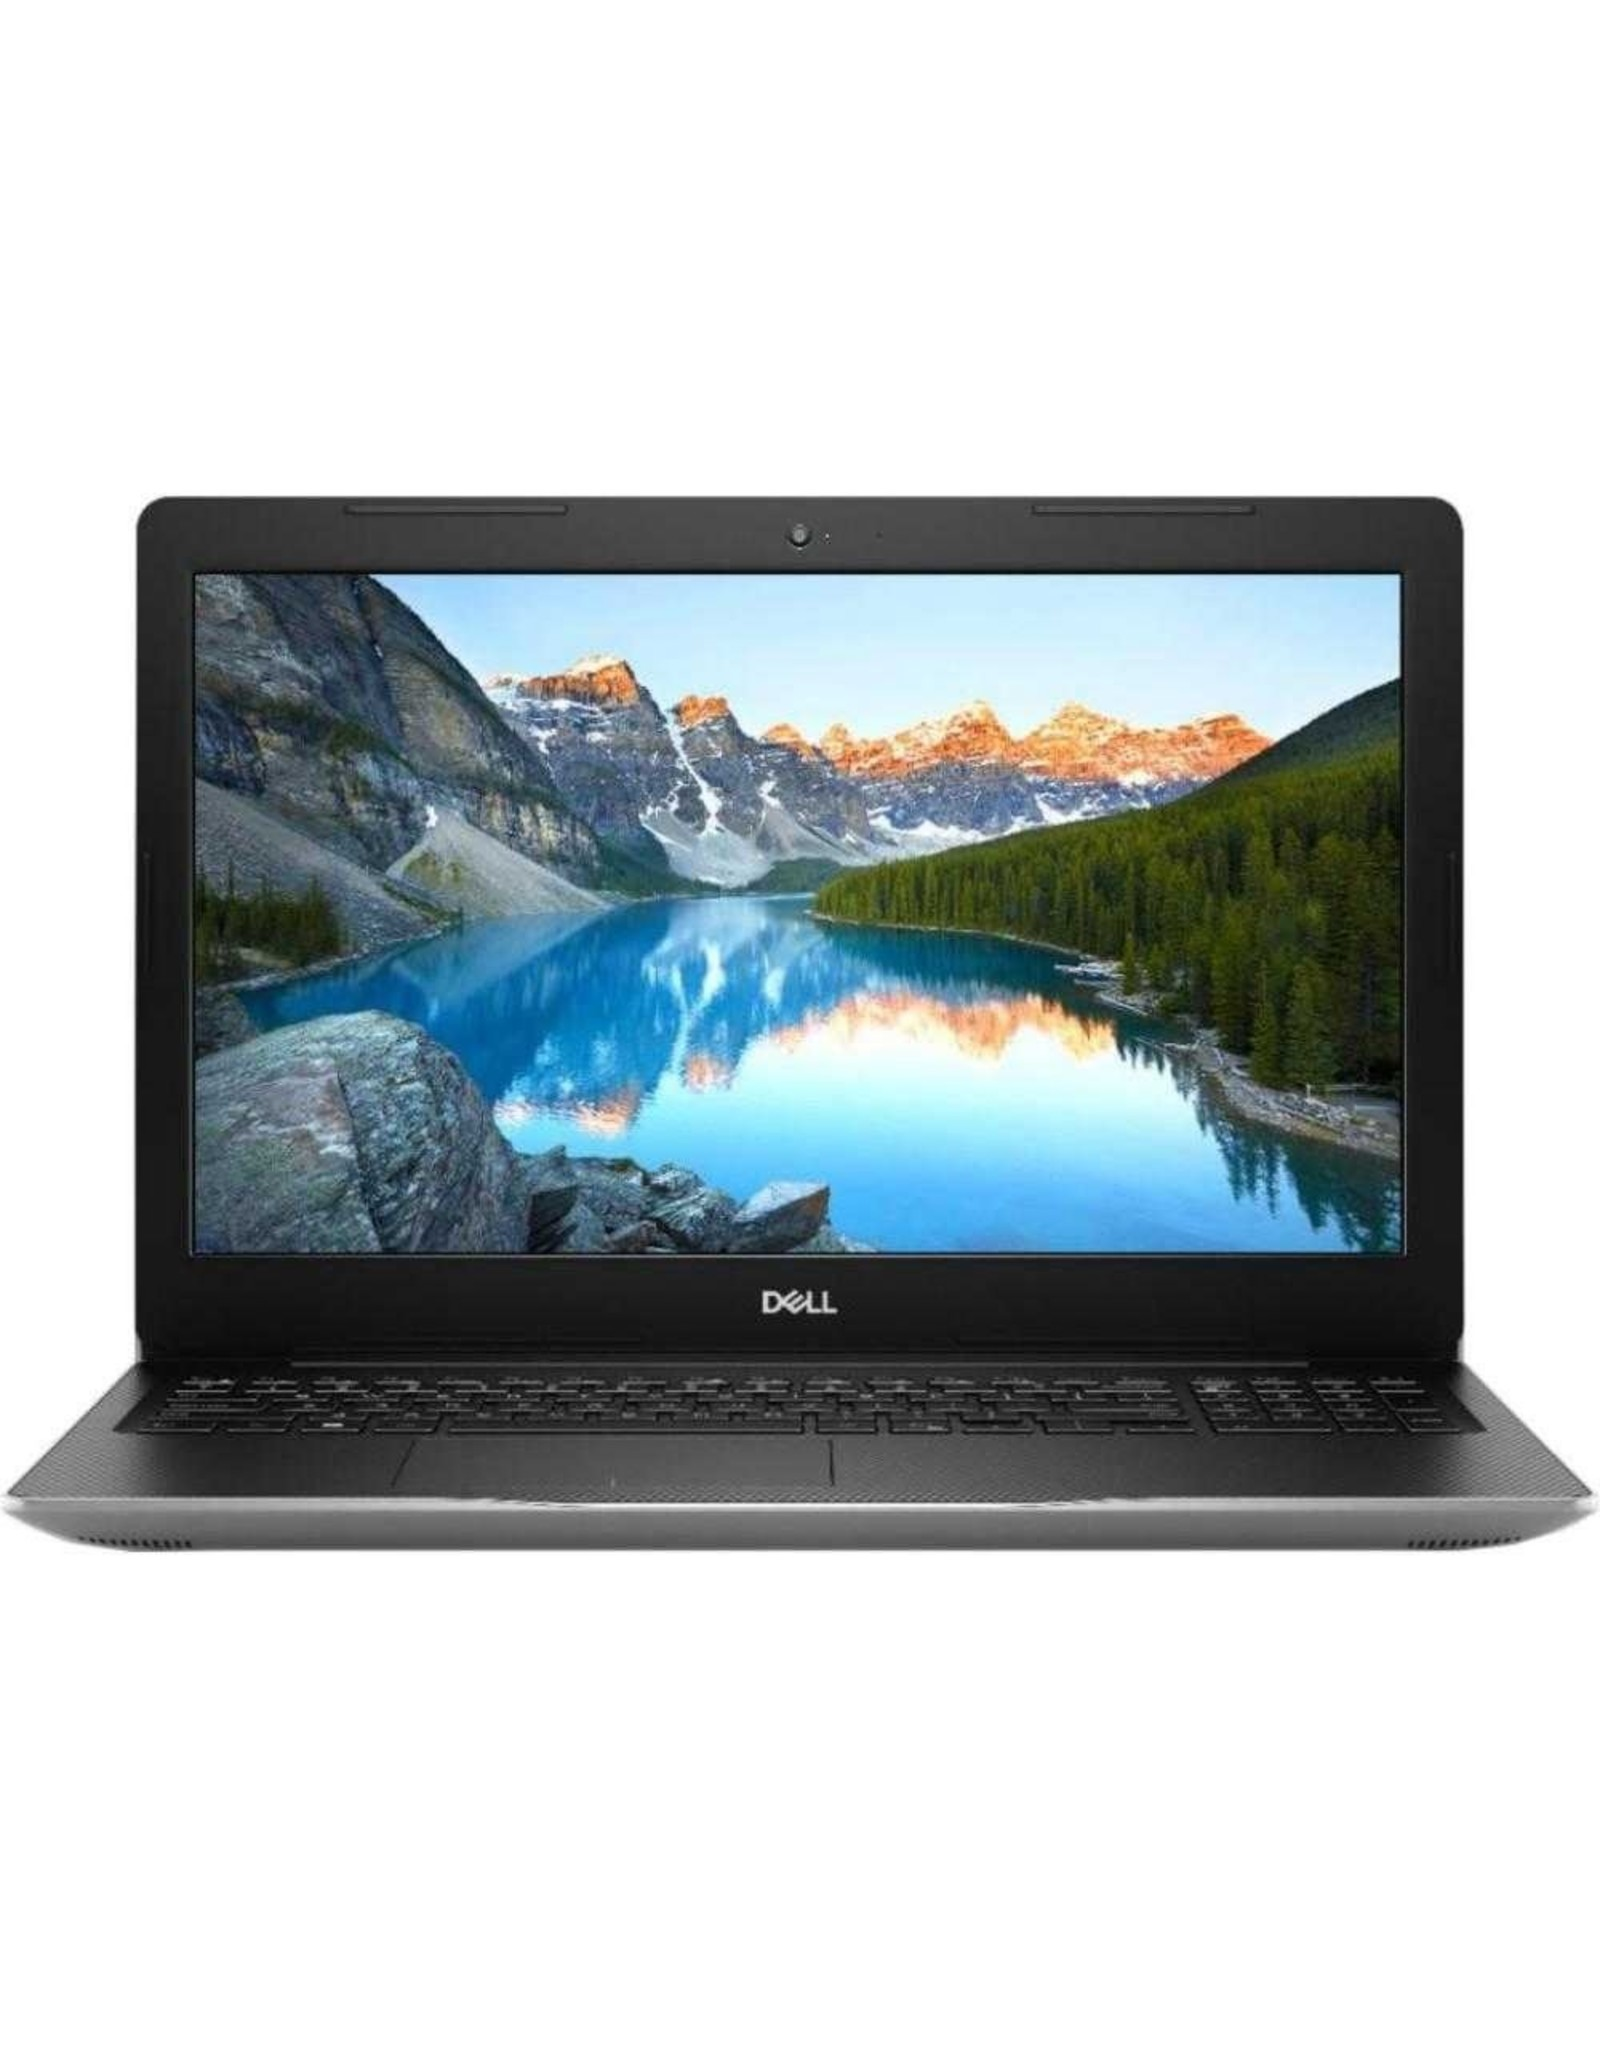 Dell 3593 15.6 F-HD i3-1005G1 / 8GB / 1TB + 256GB / W10 GREY